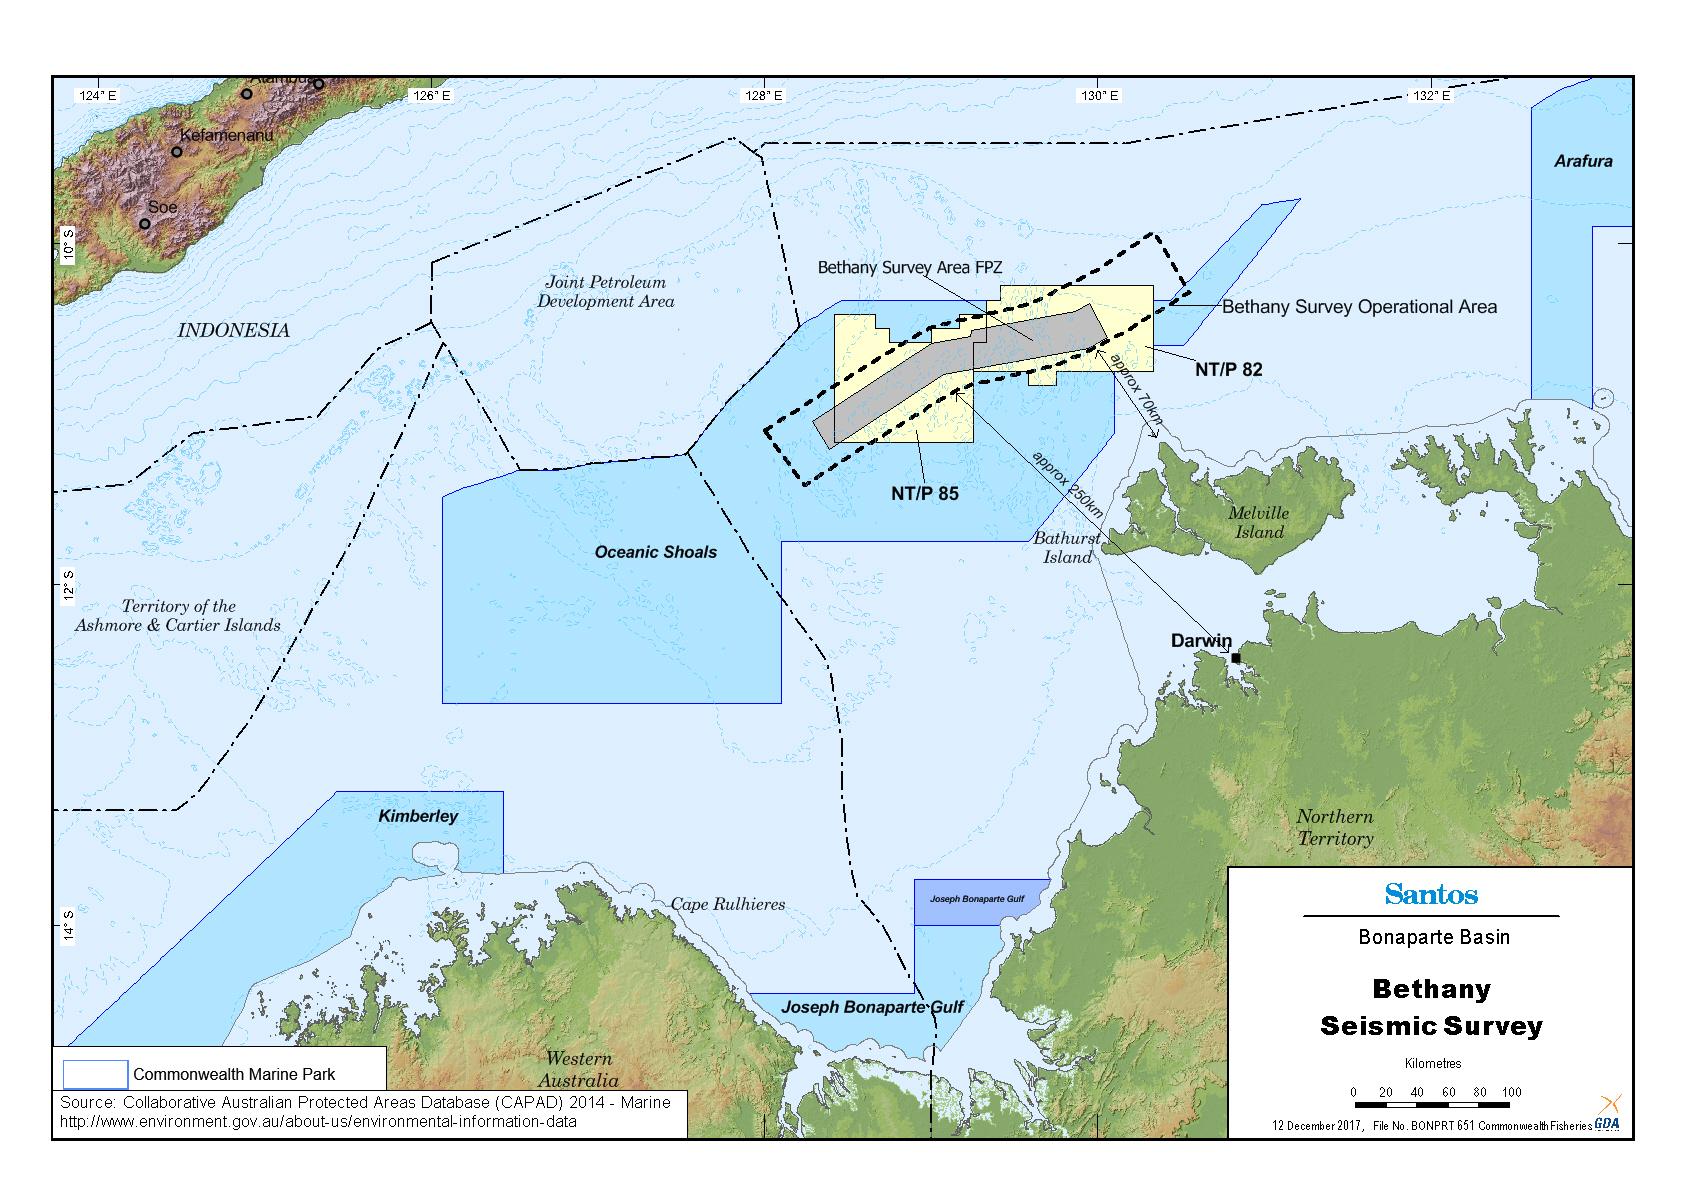 Location map - Activity: Bethany 3D Seismic Survey (refer to description)